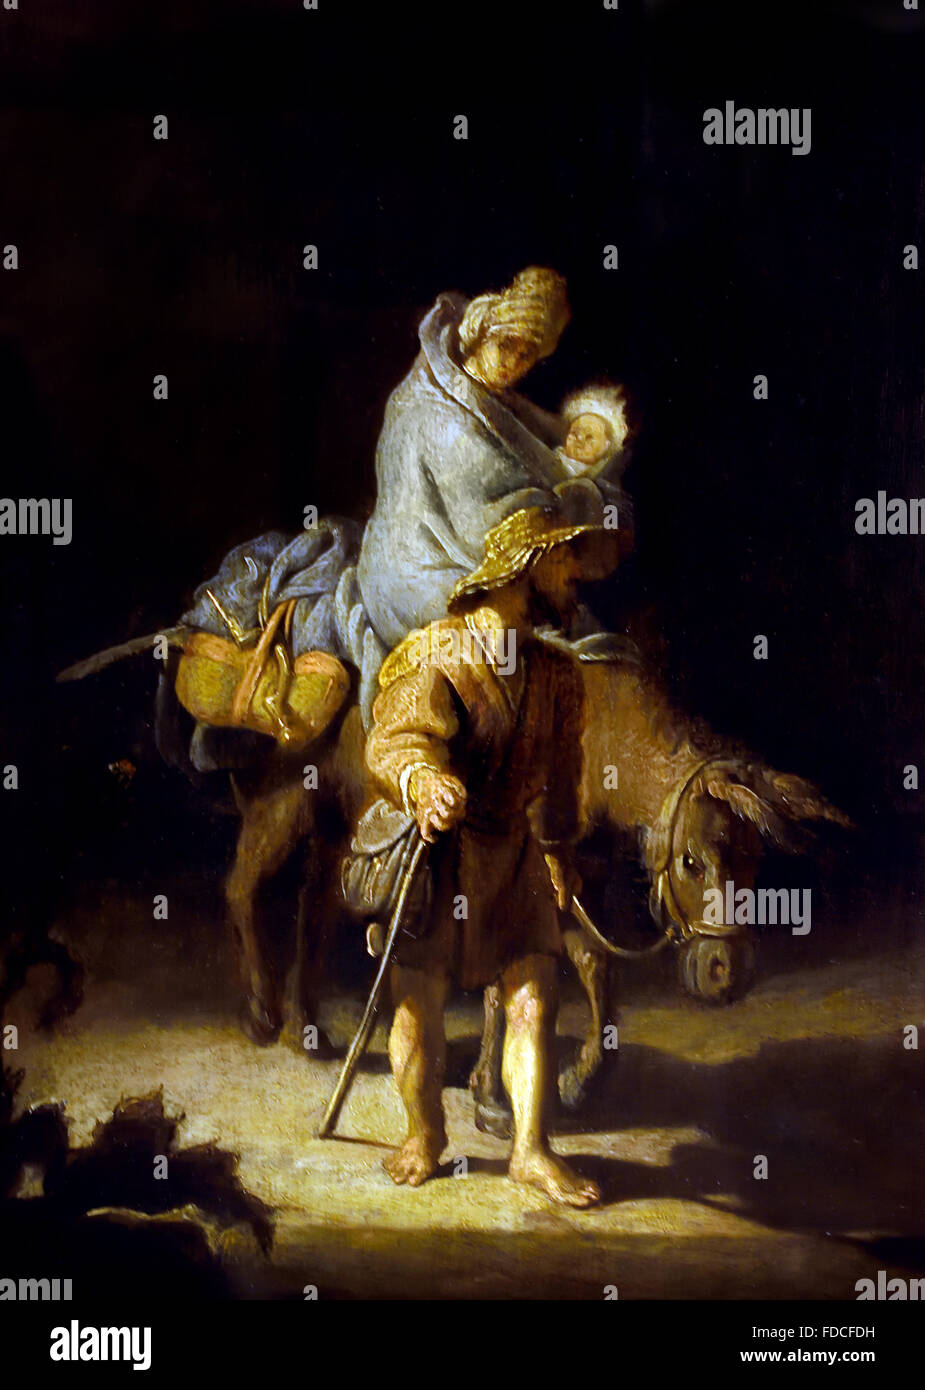 La Fluite en Egypte - The Flight into Egypt 1627 Rembrandt Harmensz van Rijn 1606 - 1669 Dutch Netherlands - Stock Image